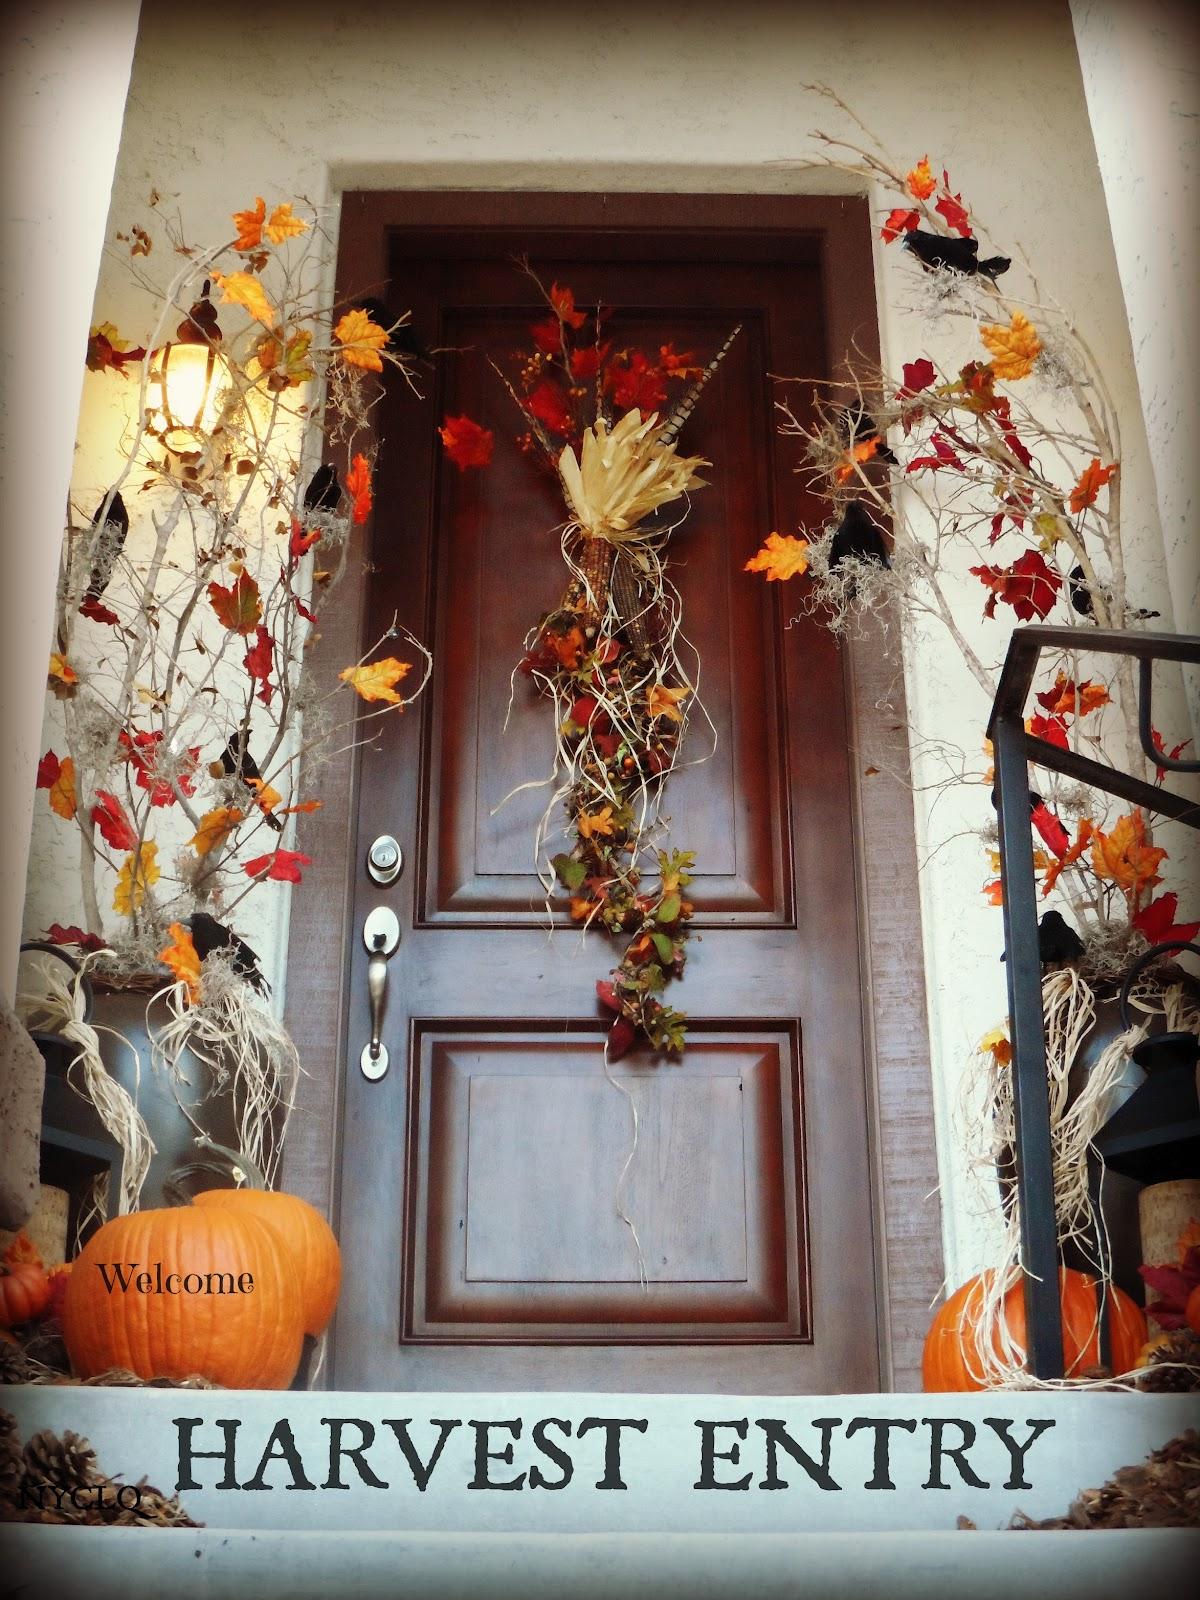 Diy outdoor fall decor - Diy Outdoor Fall Decor